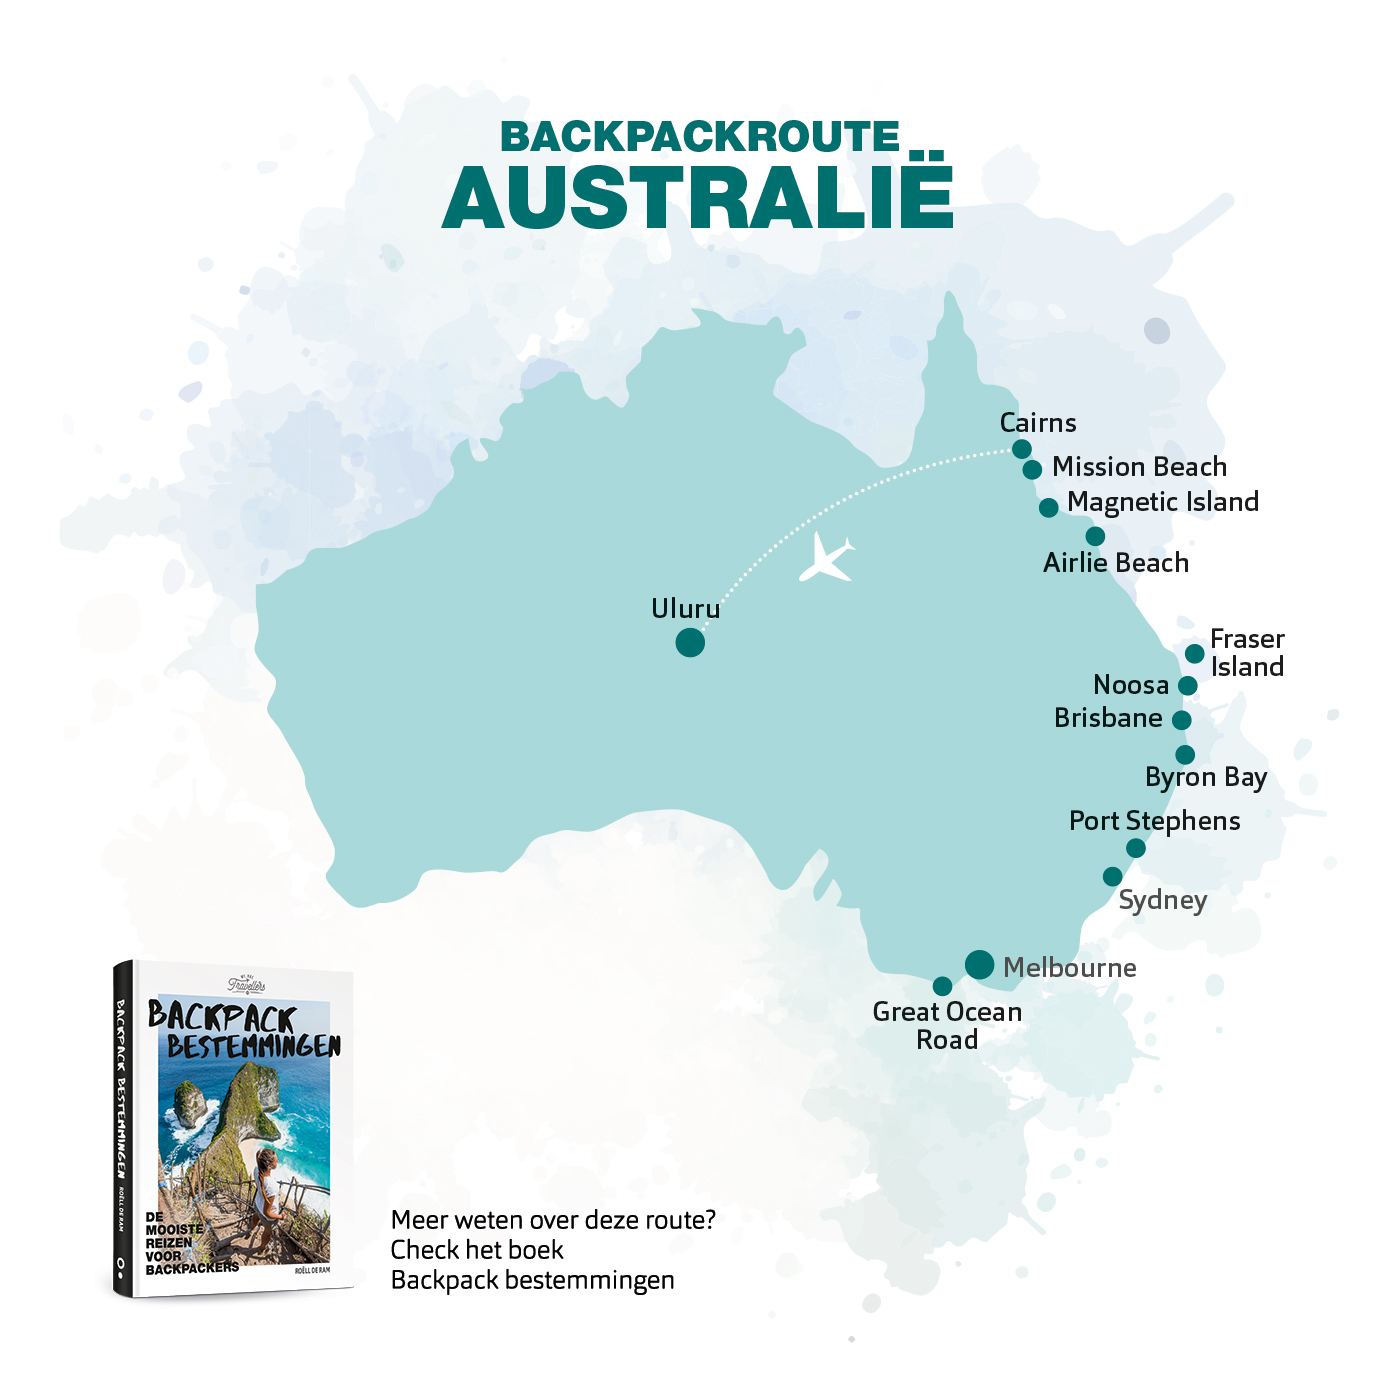 backpack route australie boek backpack bestemmingen